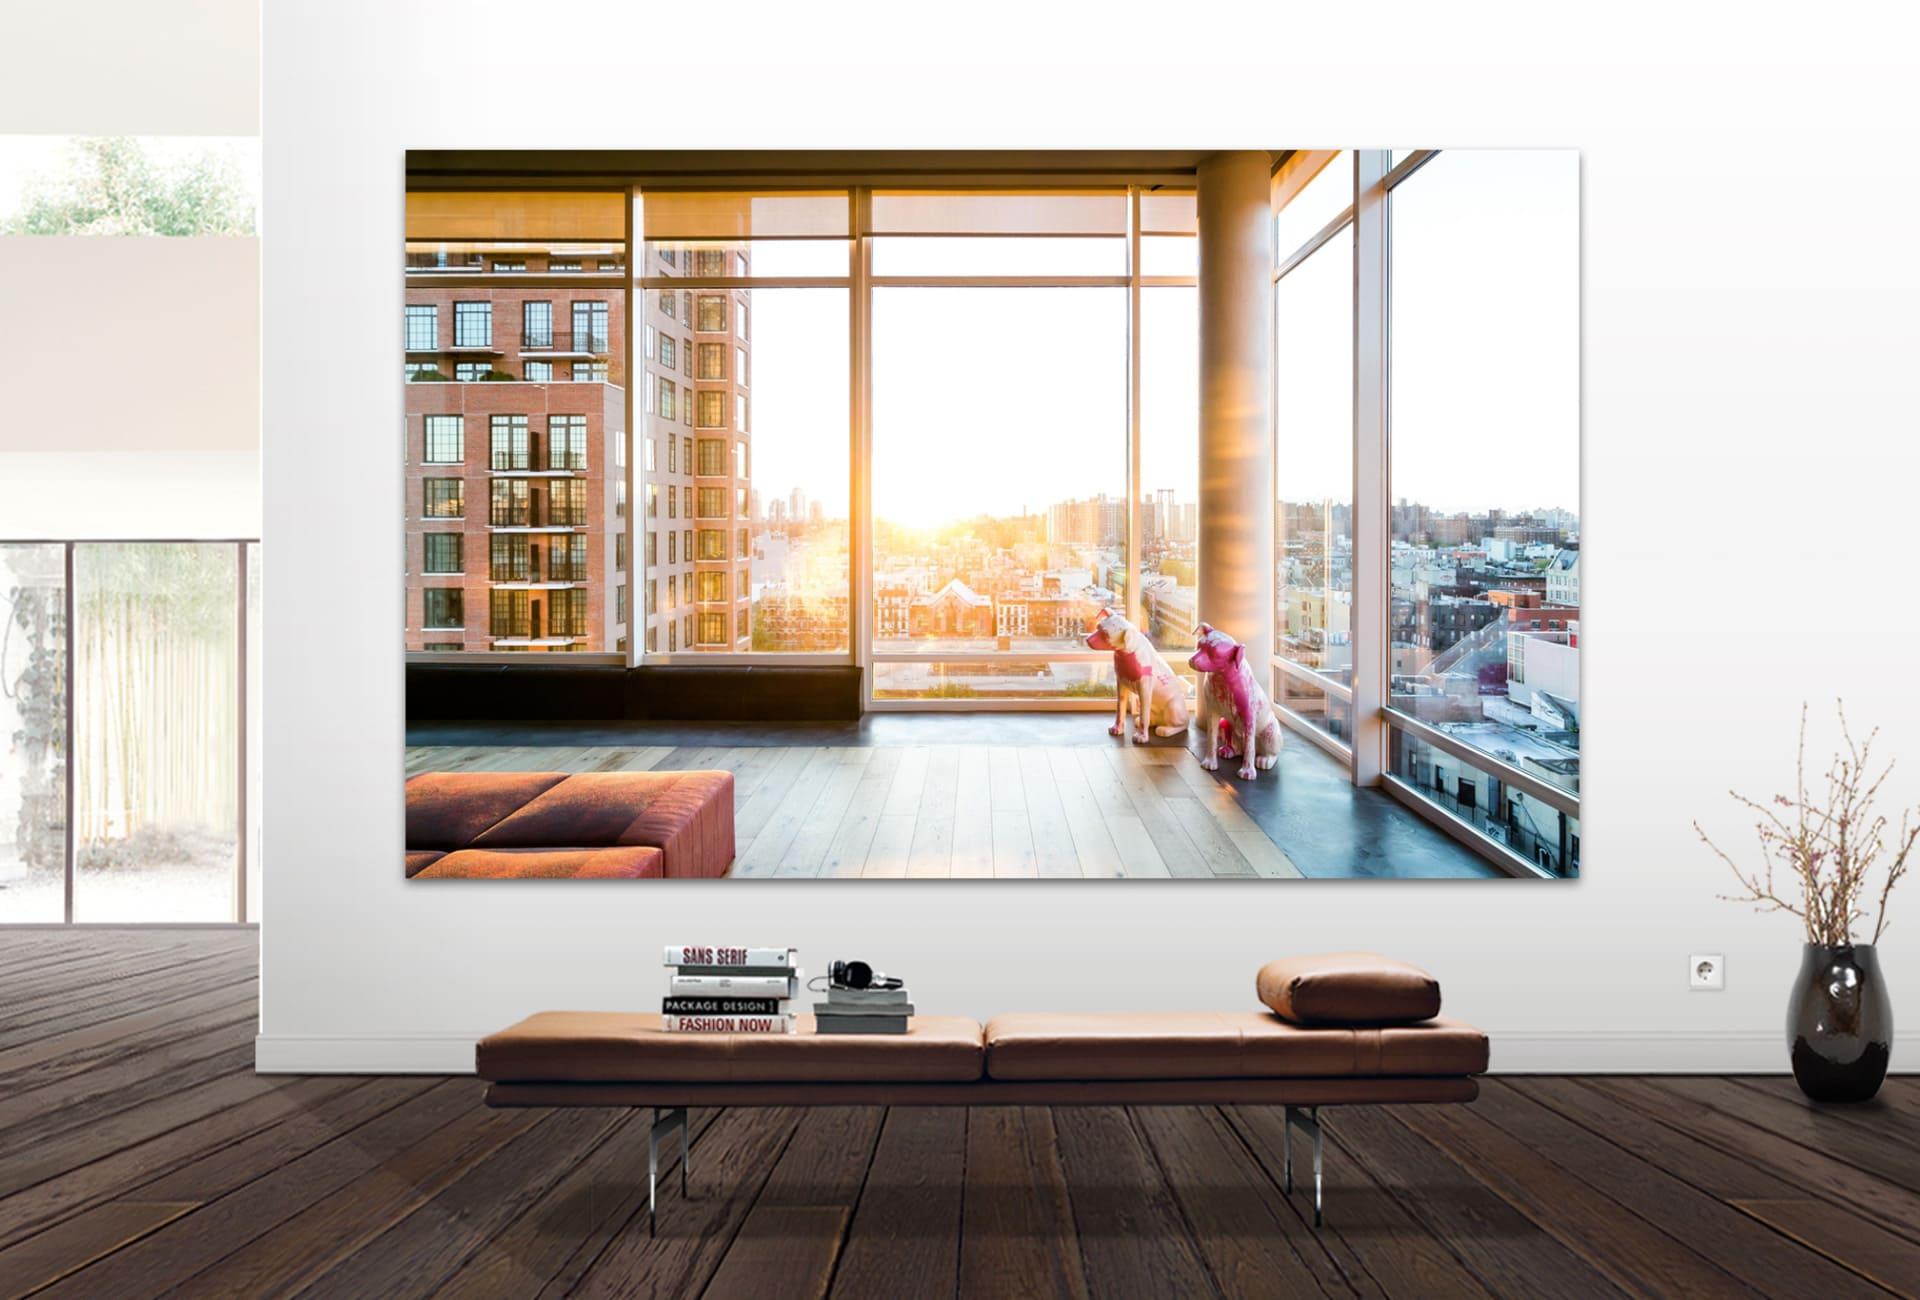 simoarts-com-simone-kessler-fotokunst-nuernberg-new-york-city-manhattan-loft-motiv1-milieu